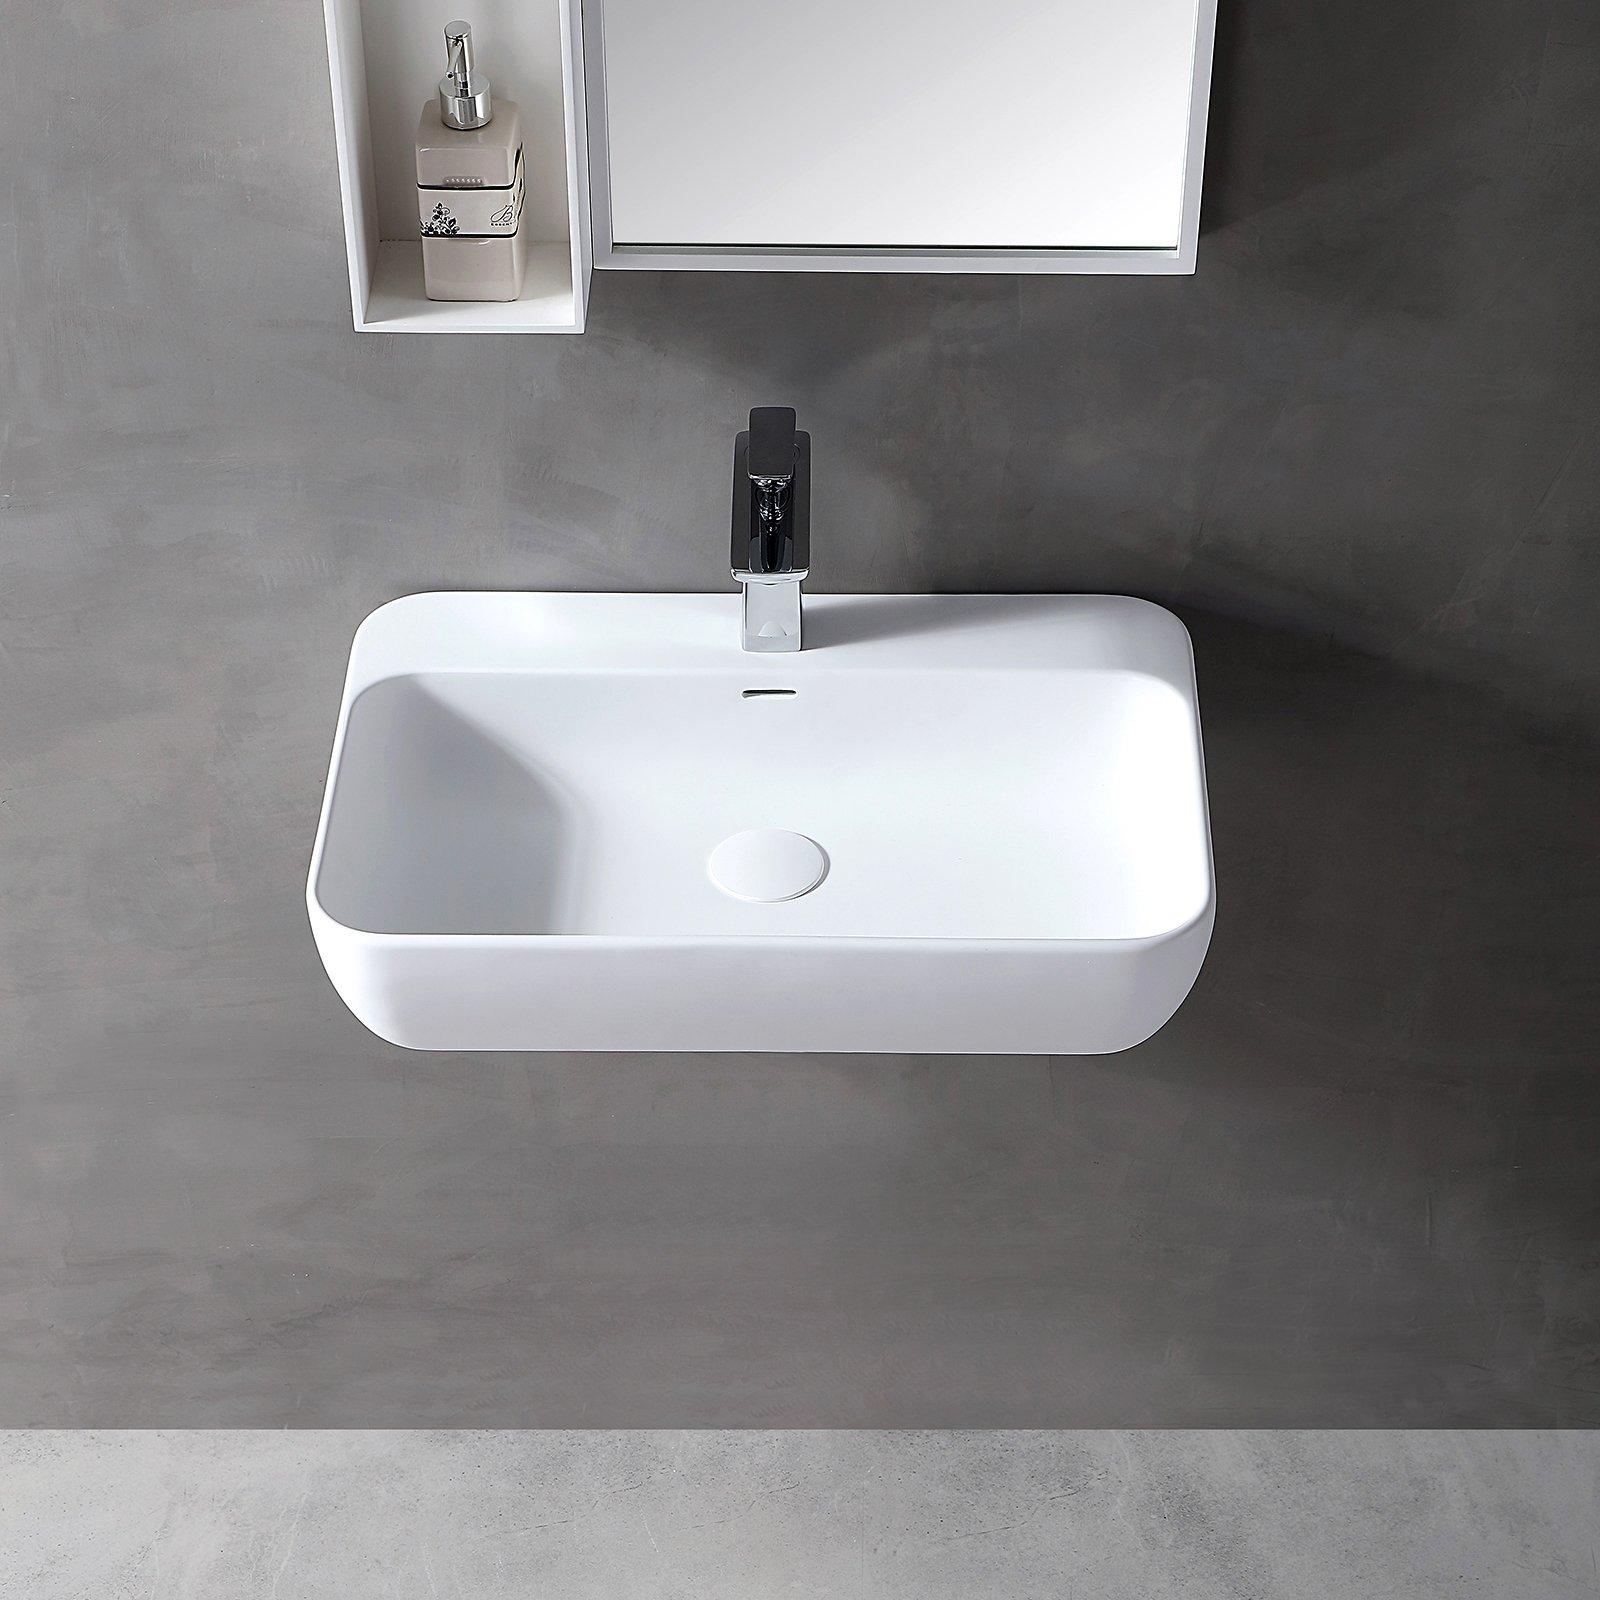 Wandwaschbecken Aufsatzwaschbecken TWG201 aus Mineralguss Solid Stone - Weiß matt - 60x40x14cm zoom thumbnail 3